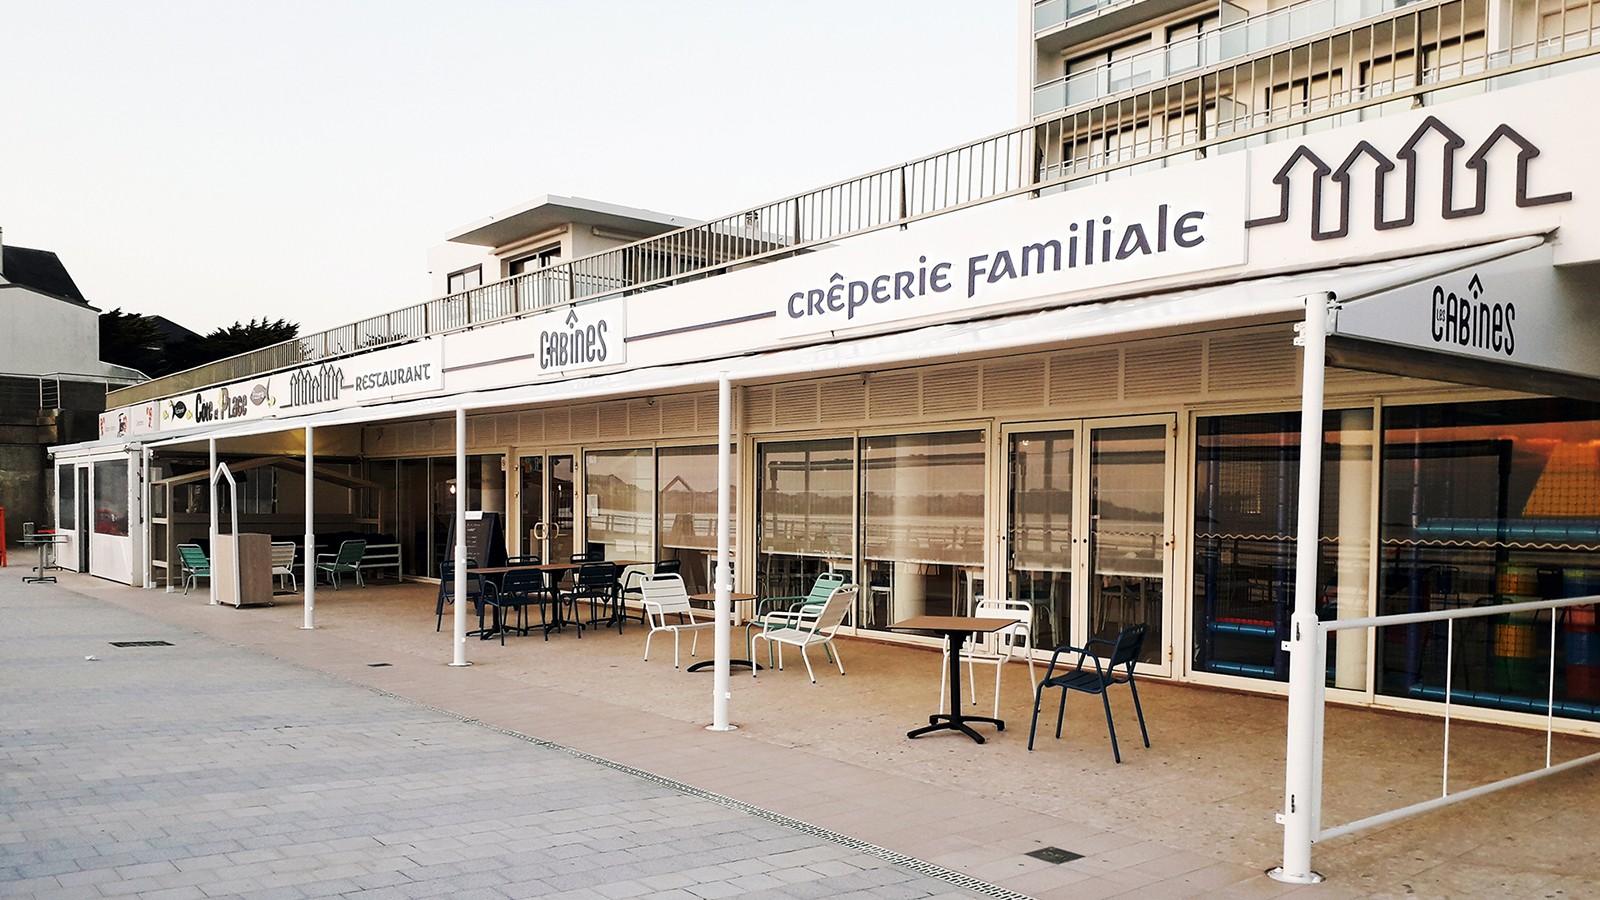 EFI Design Creperie Les Cabines Saint Gilles Efi Design (1) 1243